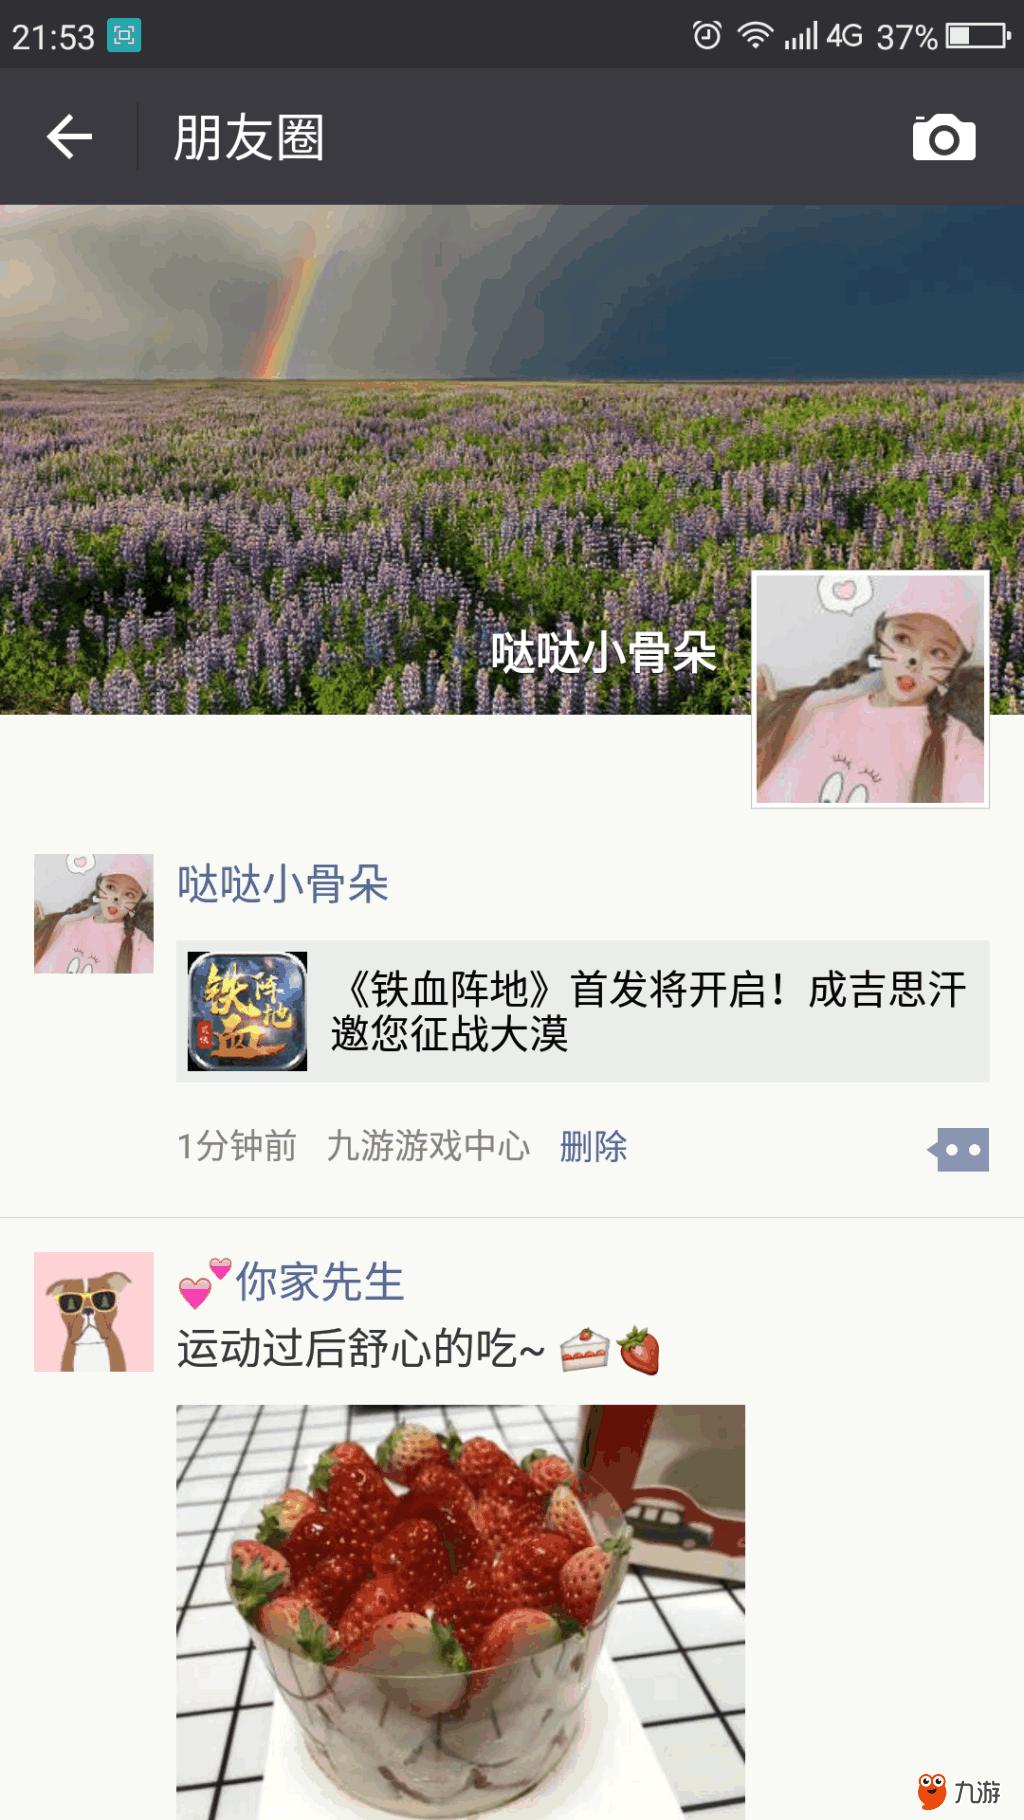 Screenshot_2018s07s15s21s53s15.png